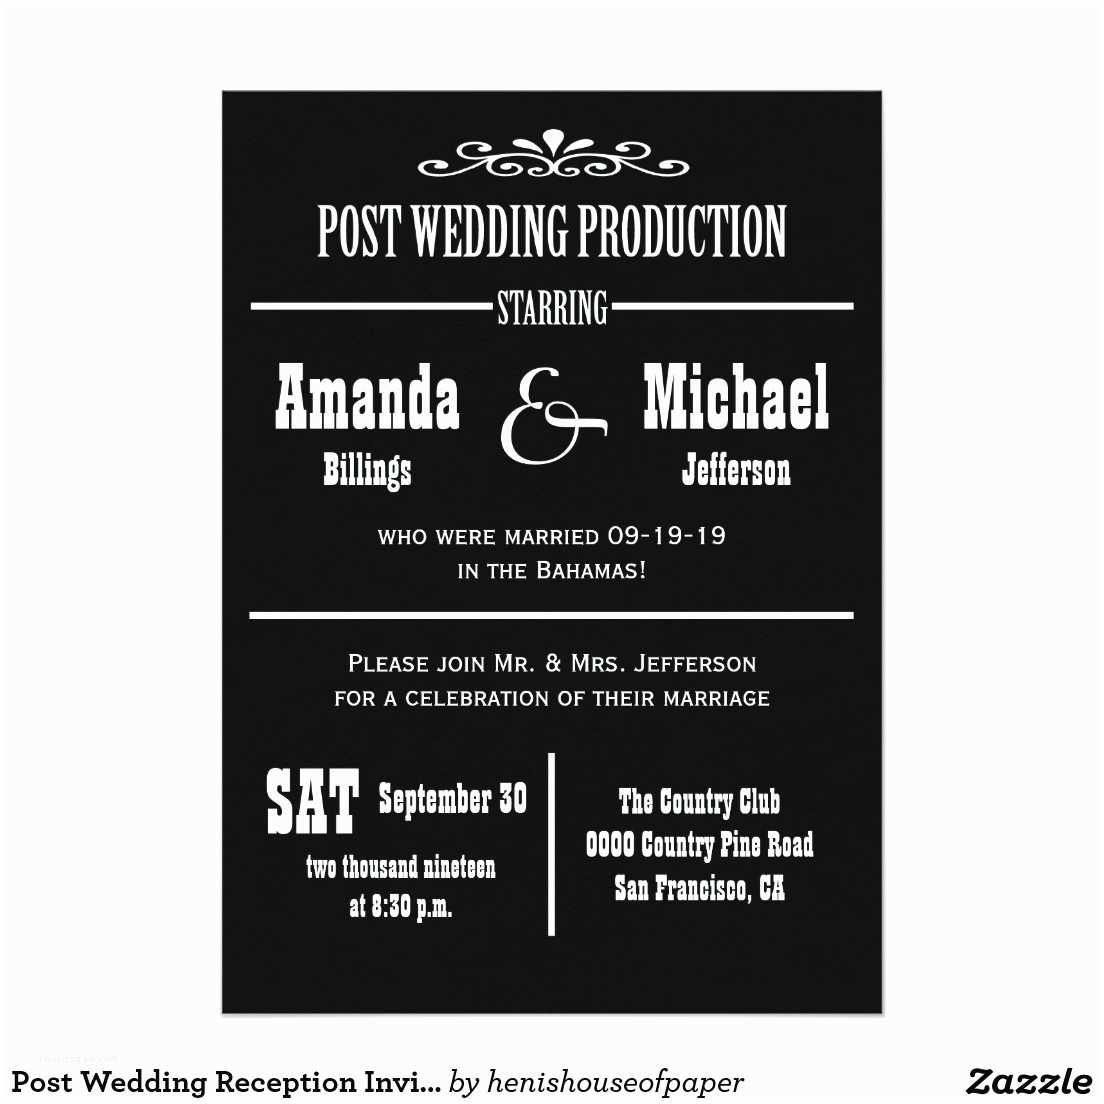 Post Wedding Celebration Invitations Post Wedding Party Invitations Invitation Librarry